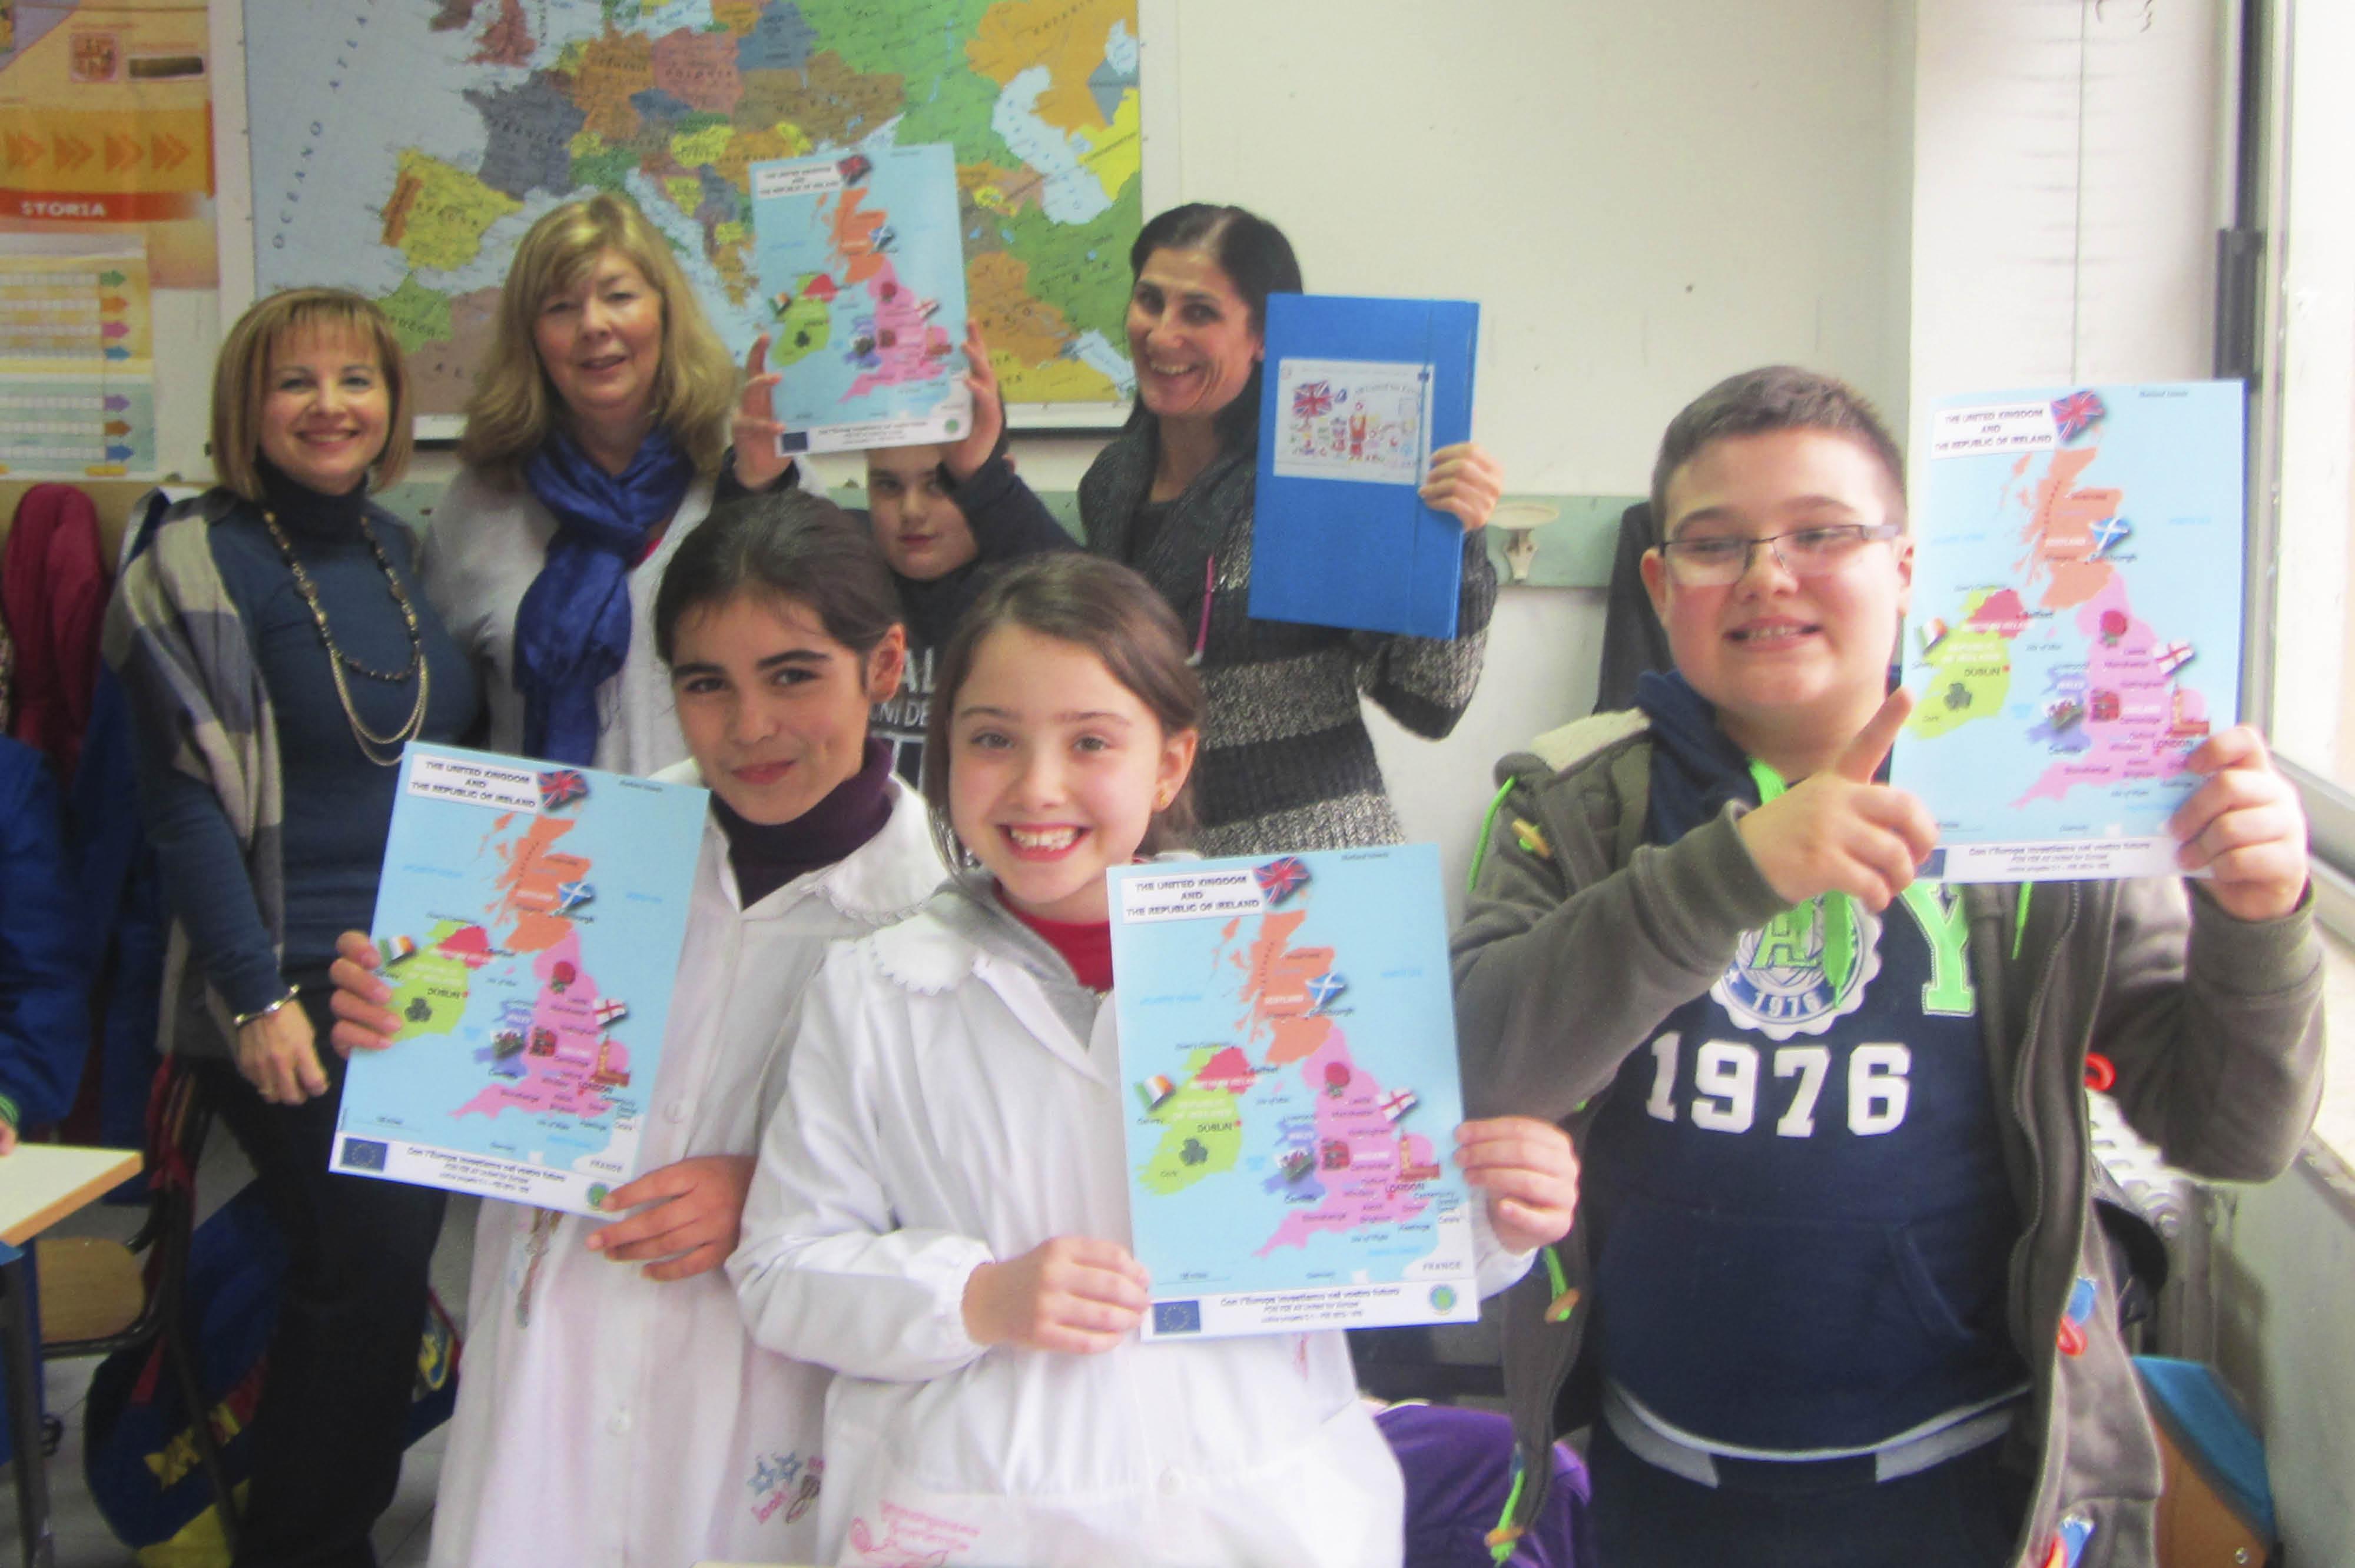 Benedict School Pomigliano d'Arco @ Somma3